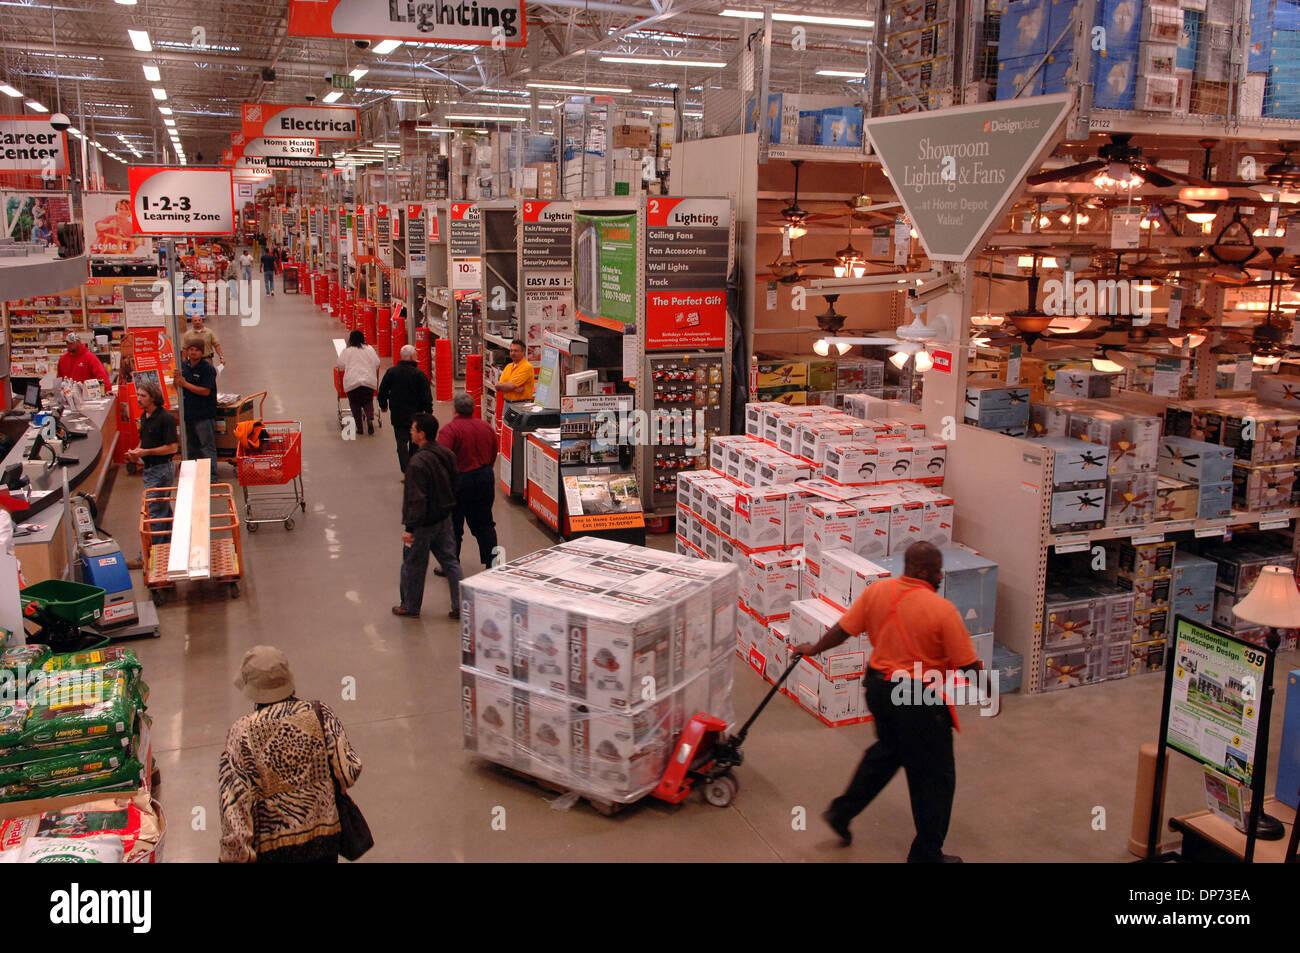 Home Depot Store Interior Stock Photos Amp Home Depot Store